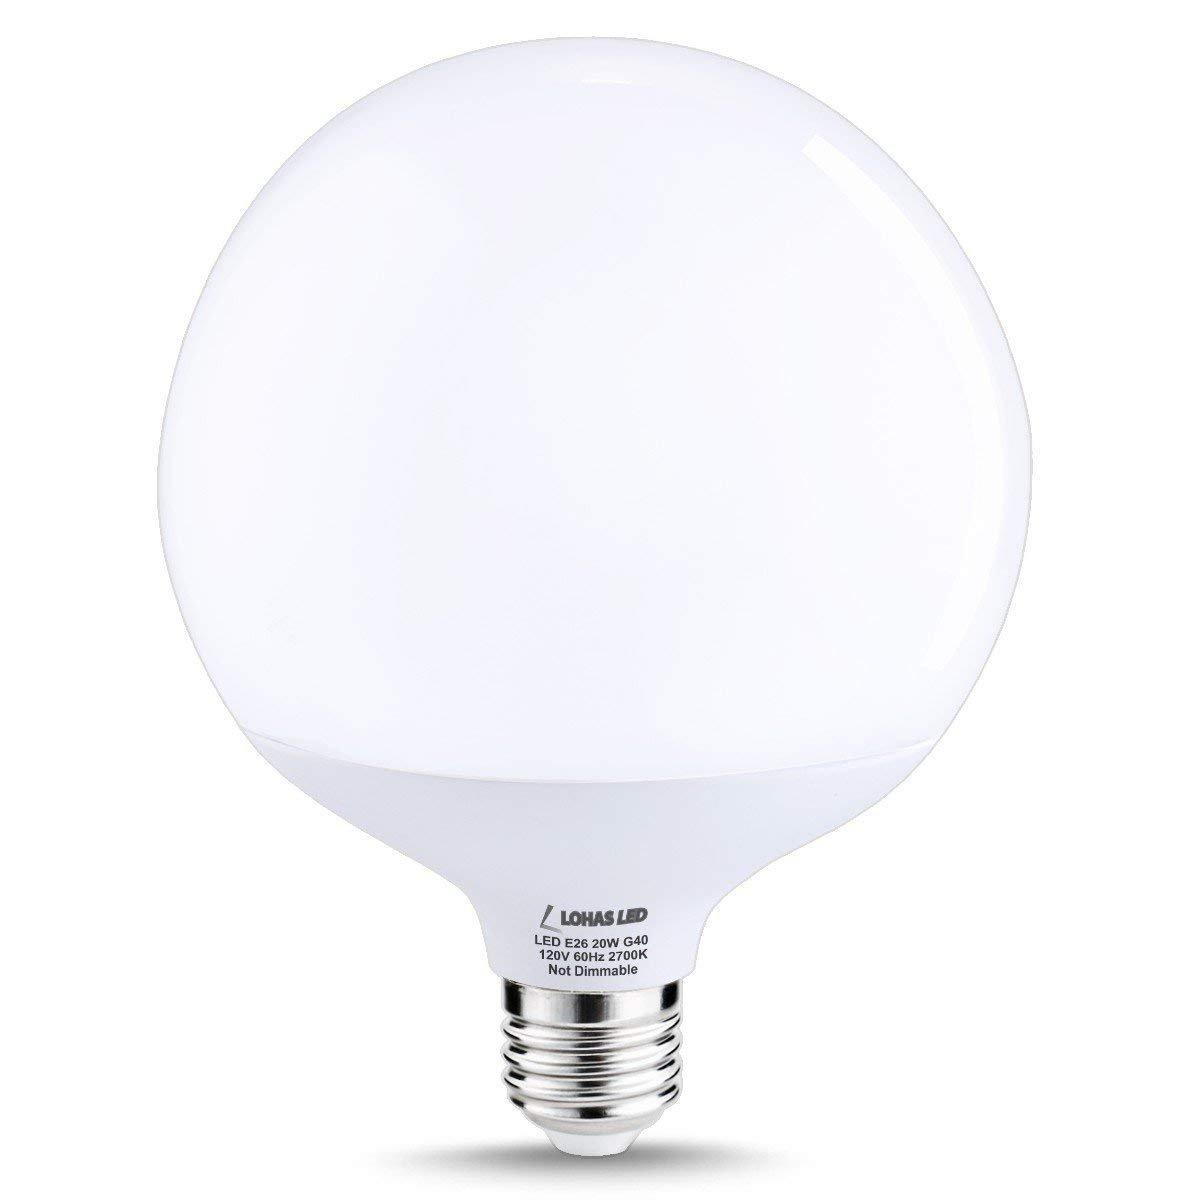 Lohas globe light bulbs g40 led 200w equivalent edison led globe bulb20w warm white 2700k e26 garage warehouse brightness light bulb 270 degree beam